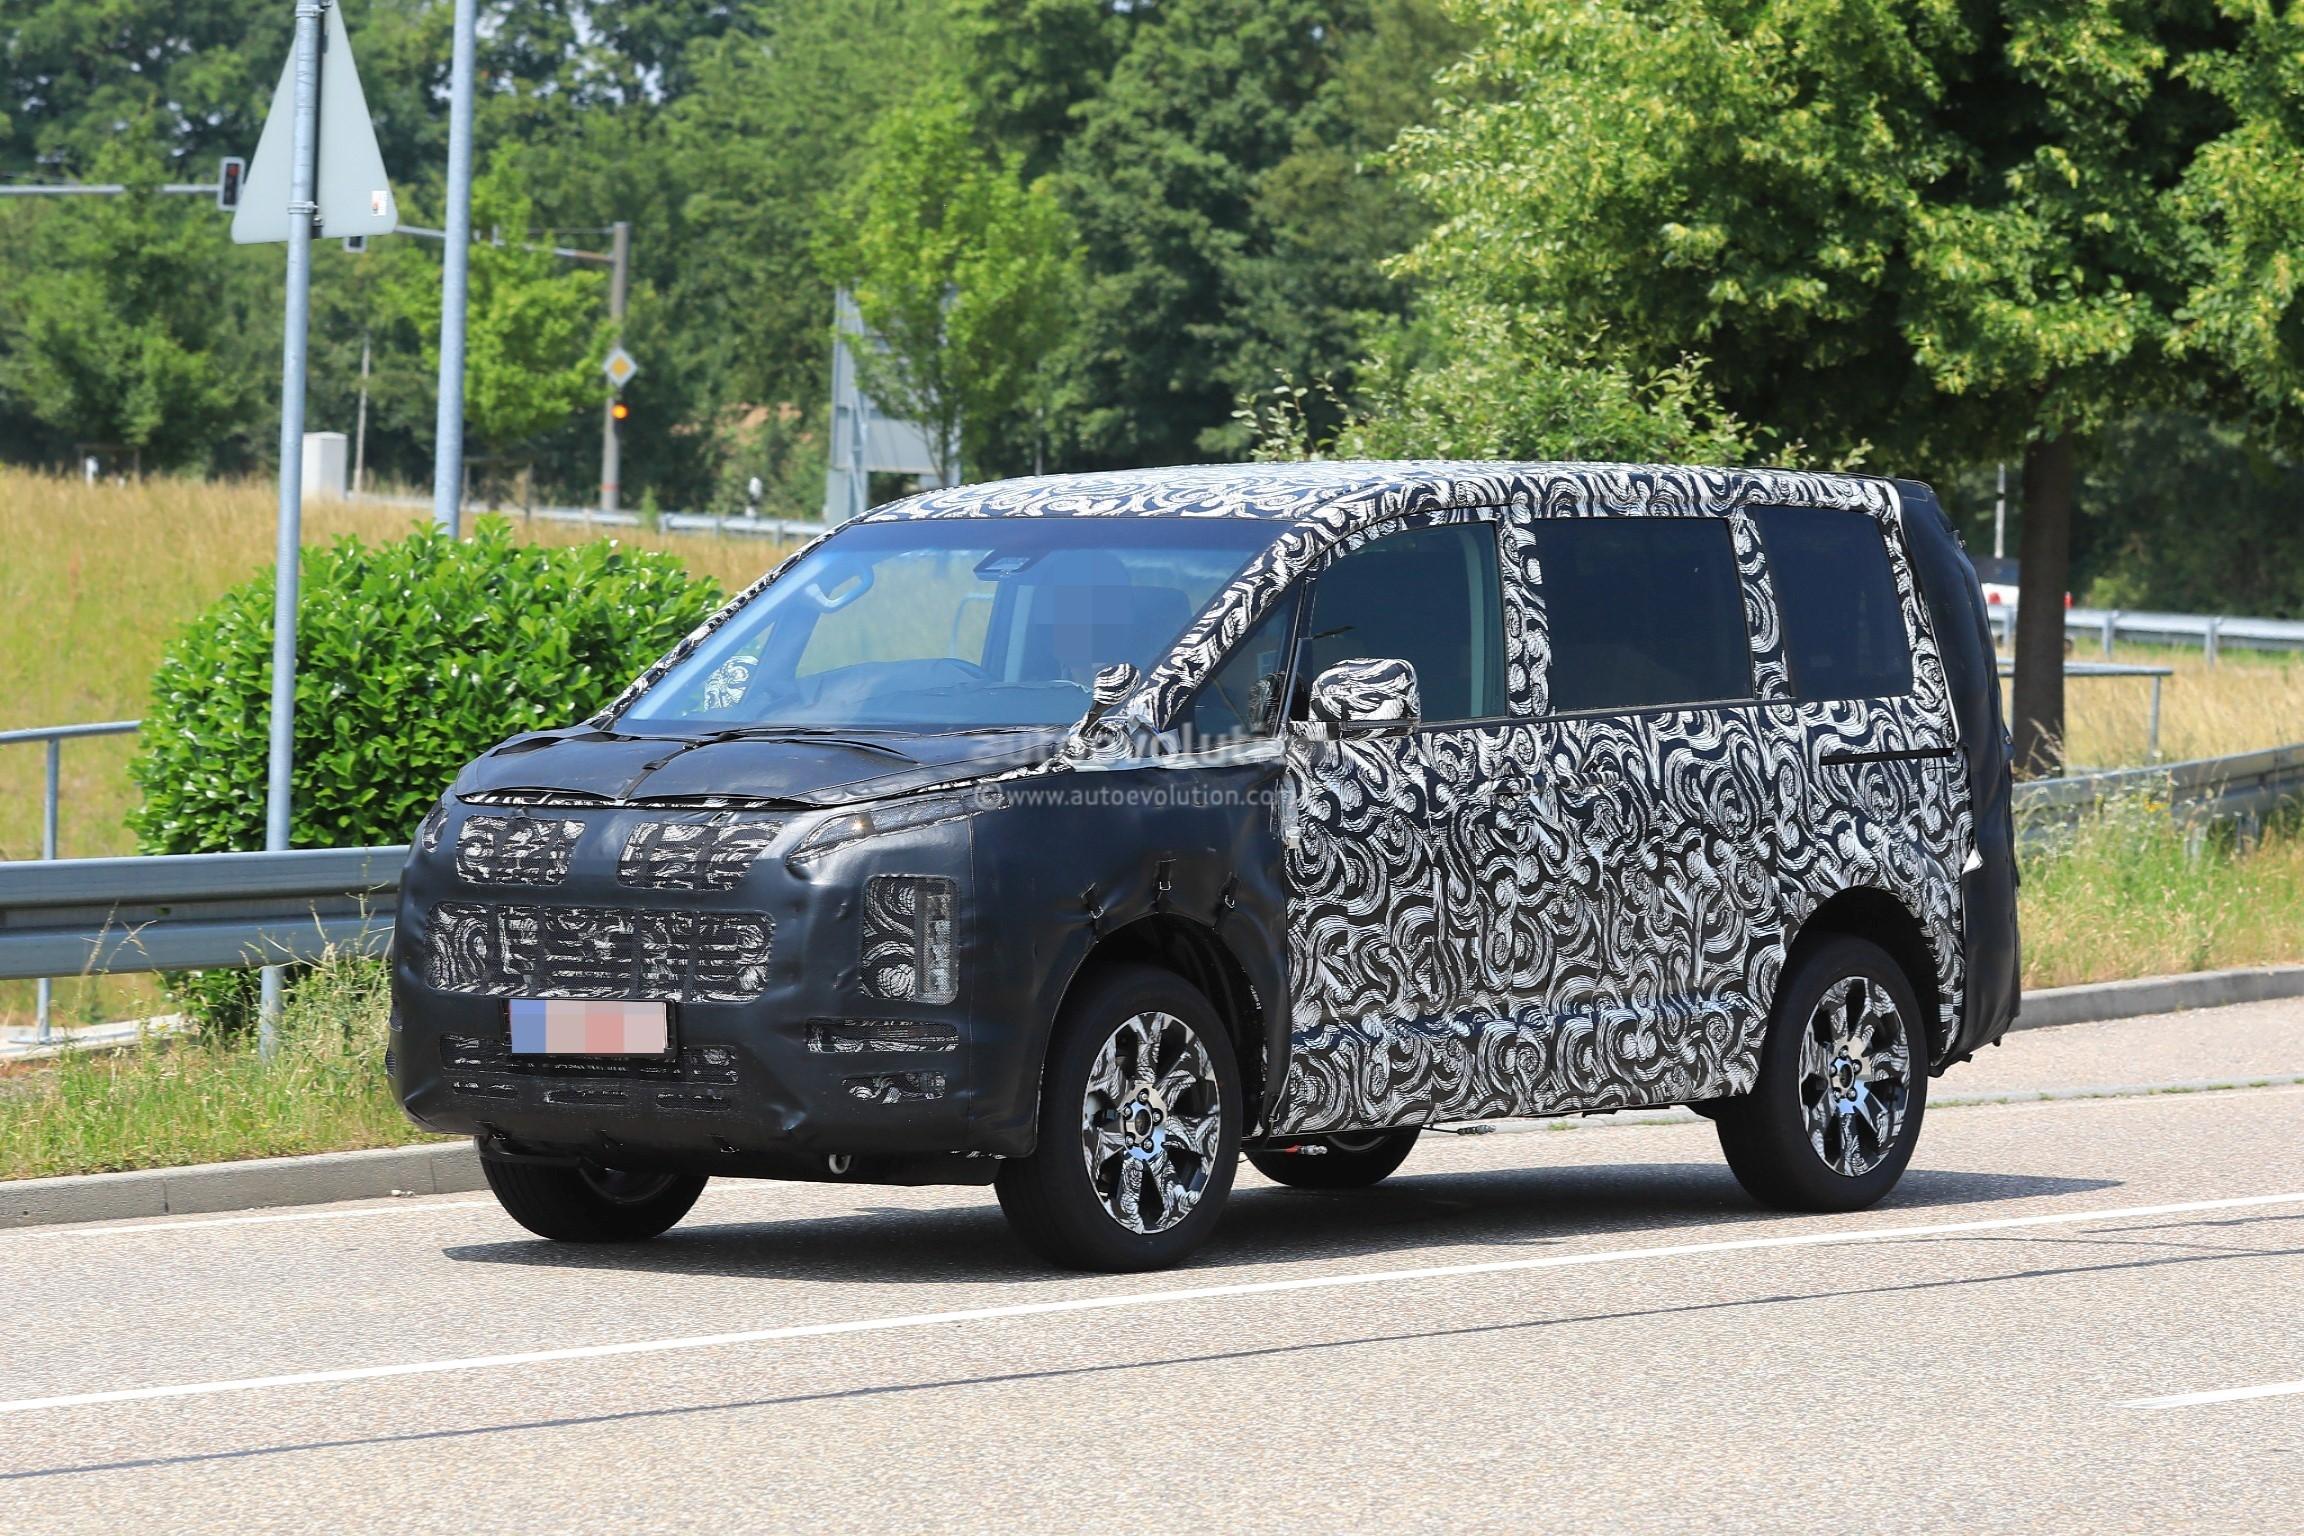 2019 Mitsubishi Delica Combines MPV Practicality With ...